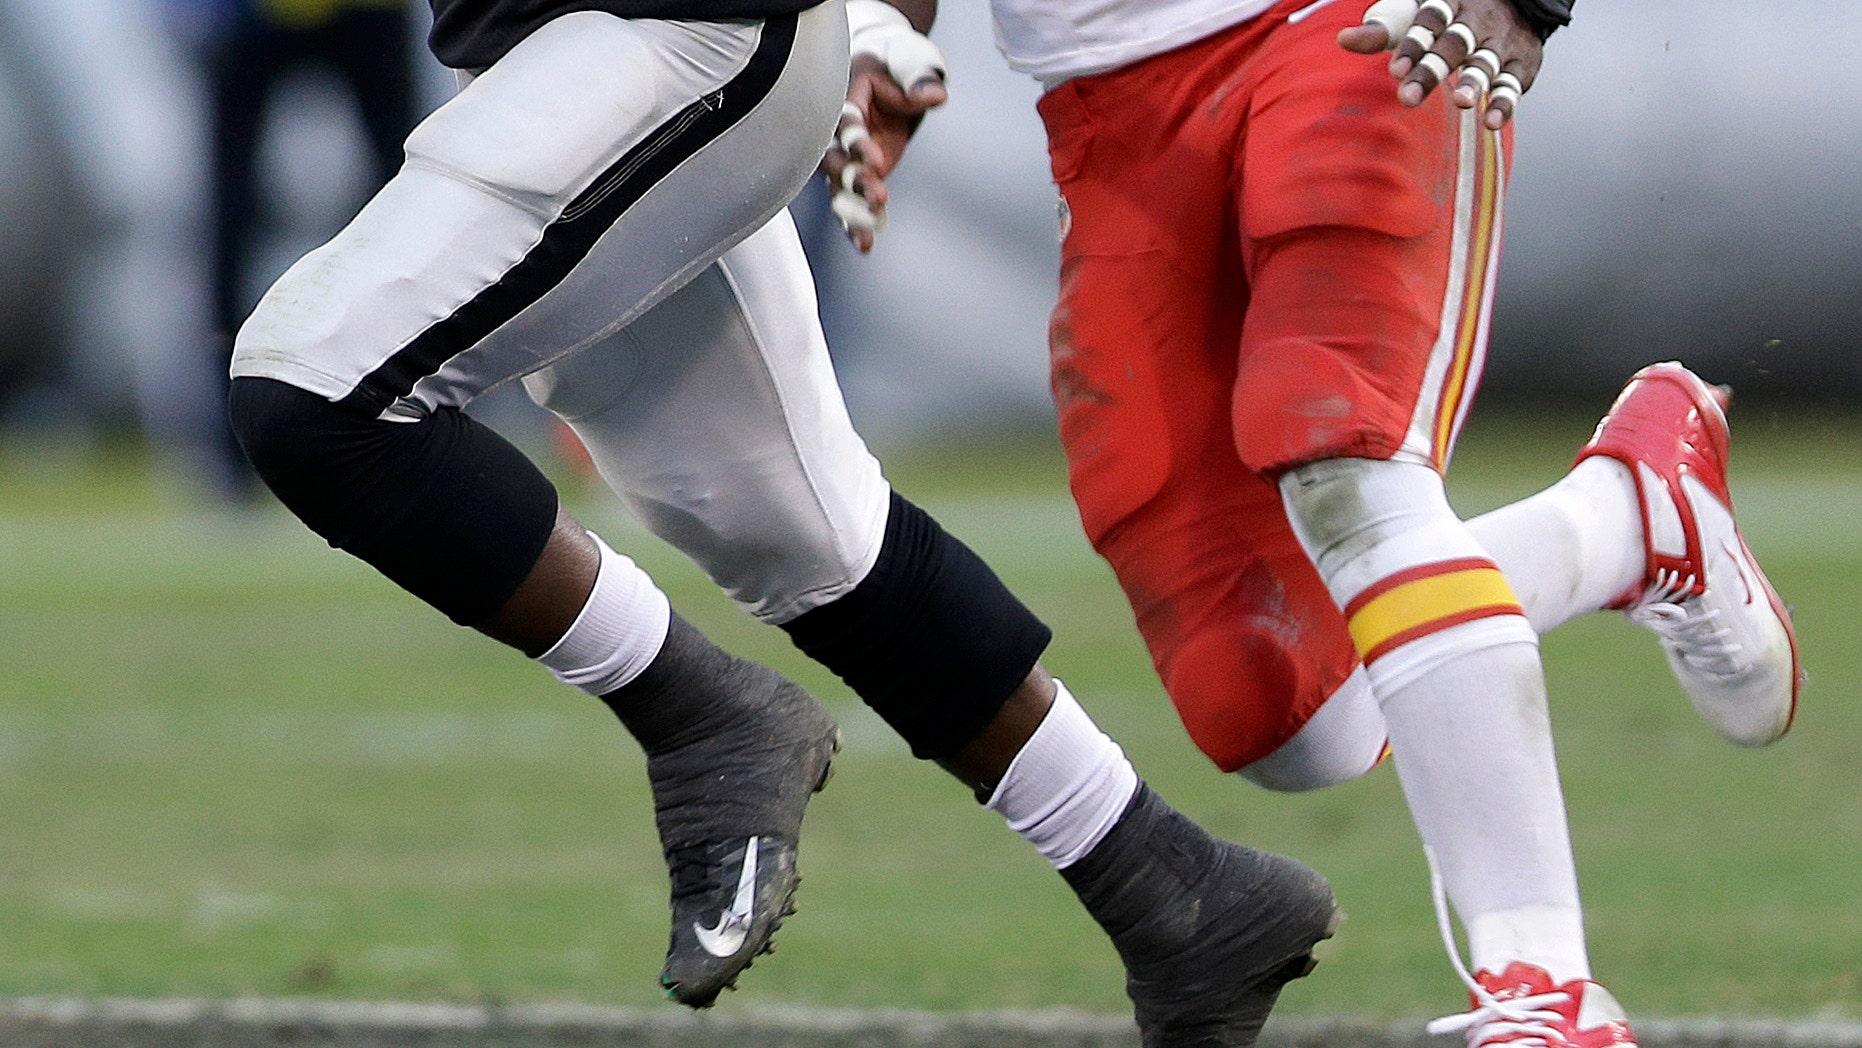 Oakland Raiders running back Mike Goodson (25) runs past Kansas City Chiefs outside linebacker Justin Houston (50) during the third quarter of an NFL football game in Oakland, Calif., Sunday, Dec. 16, 2012. (AP Photo/Marcio Jose Sanchez)